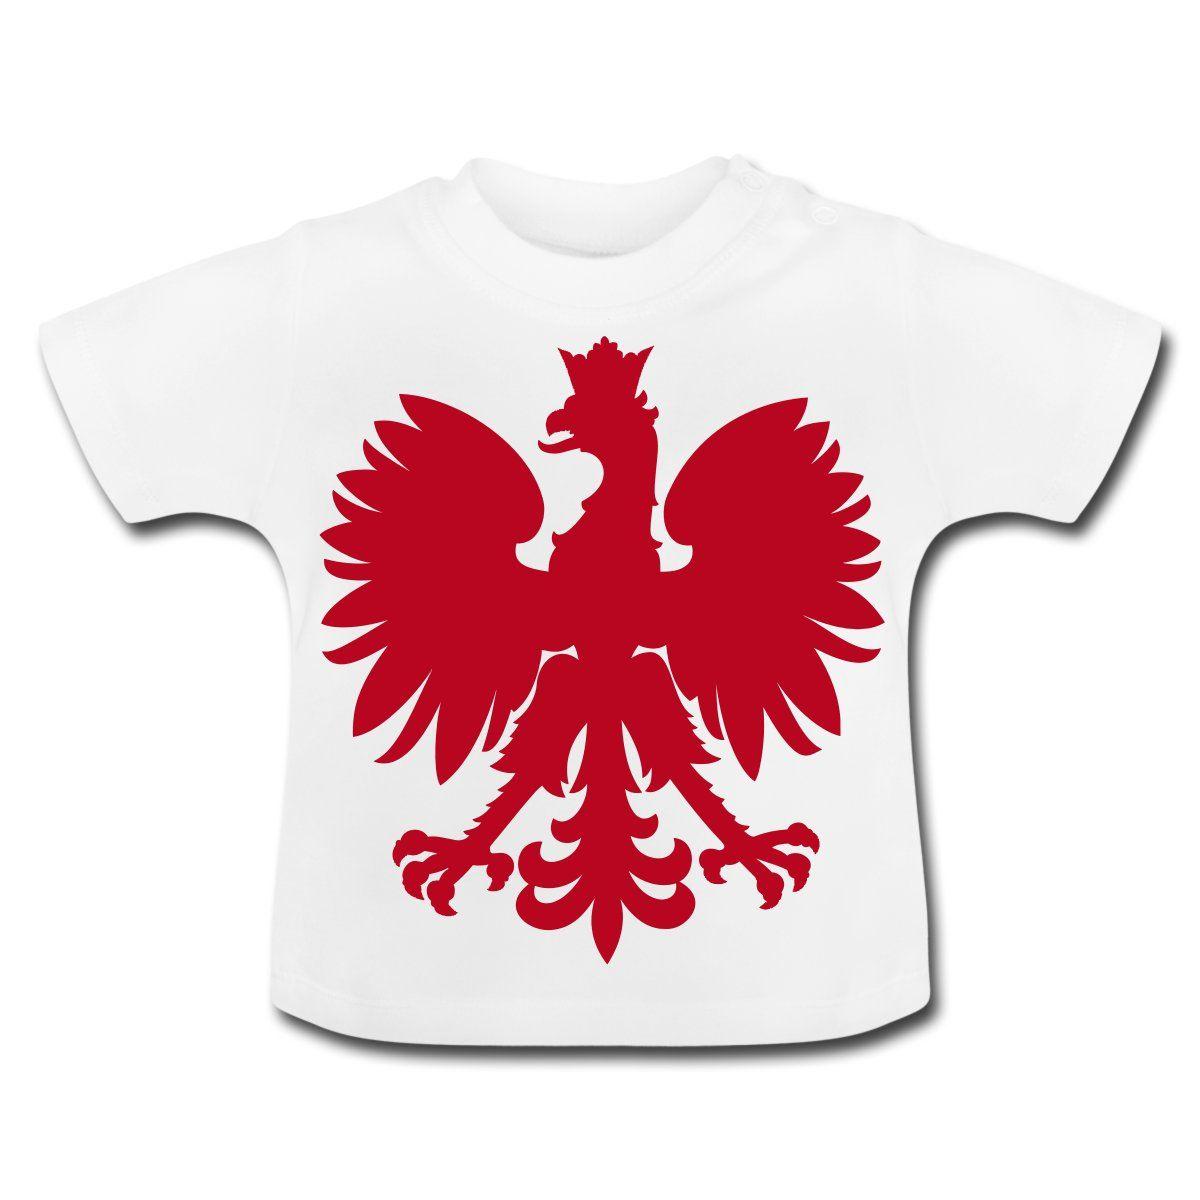 Polska Baby Shirt [Weiß/Rot/Samtig] - Baby T-Shirt